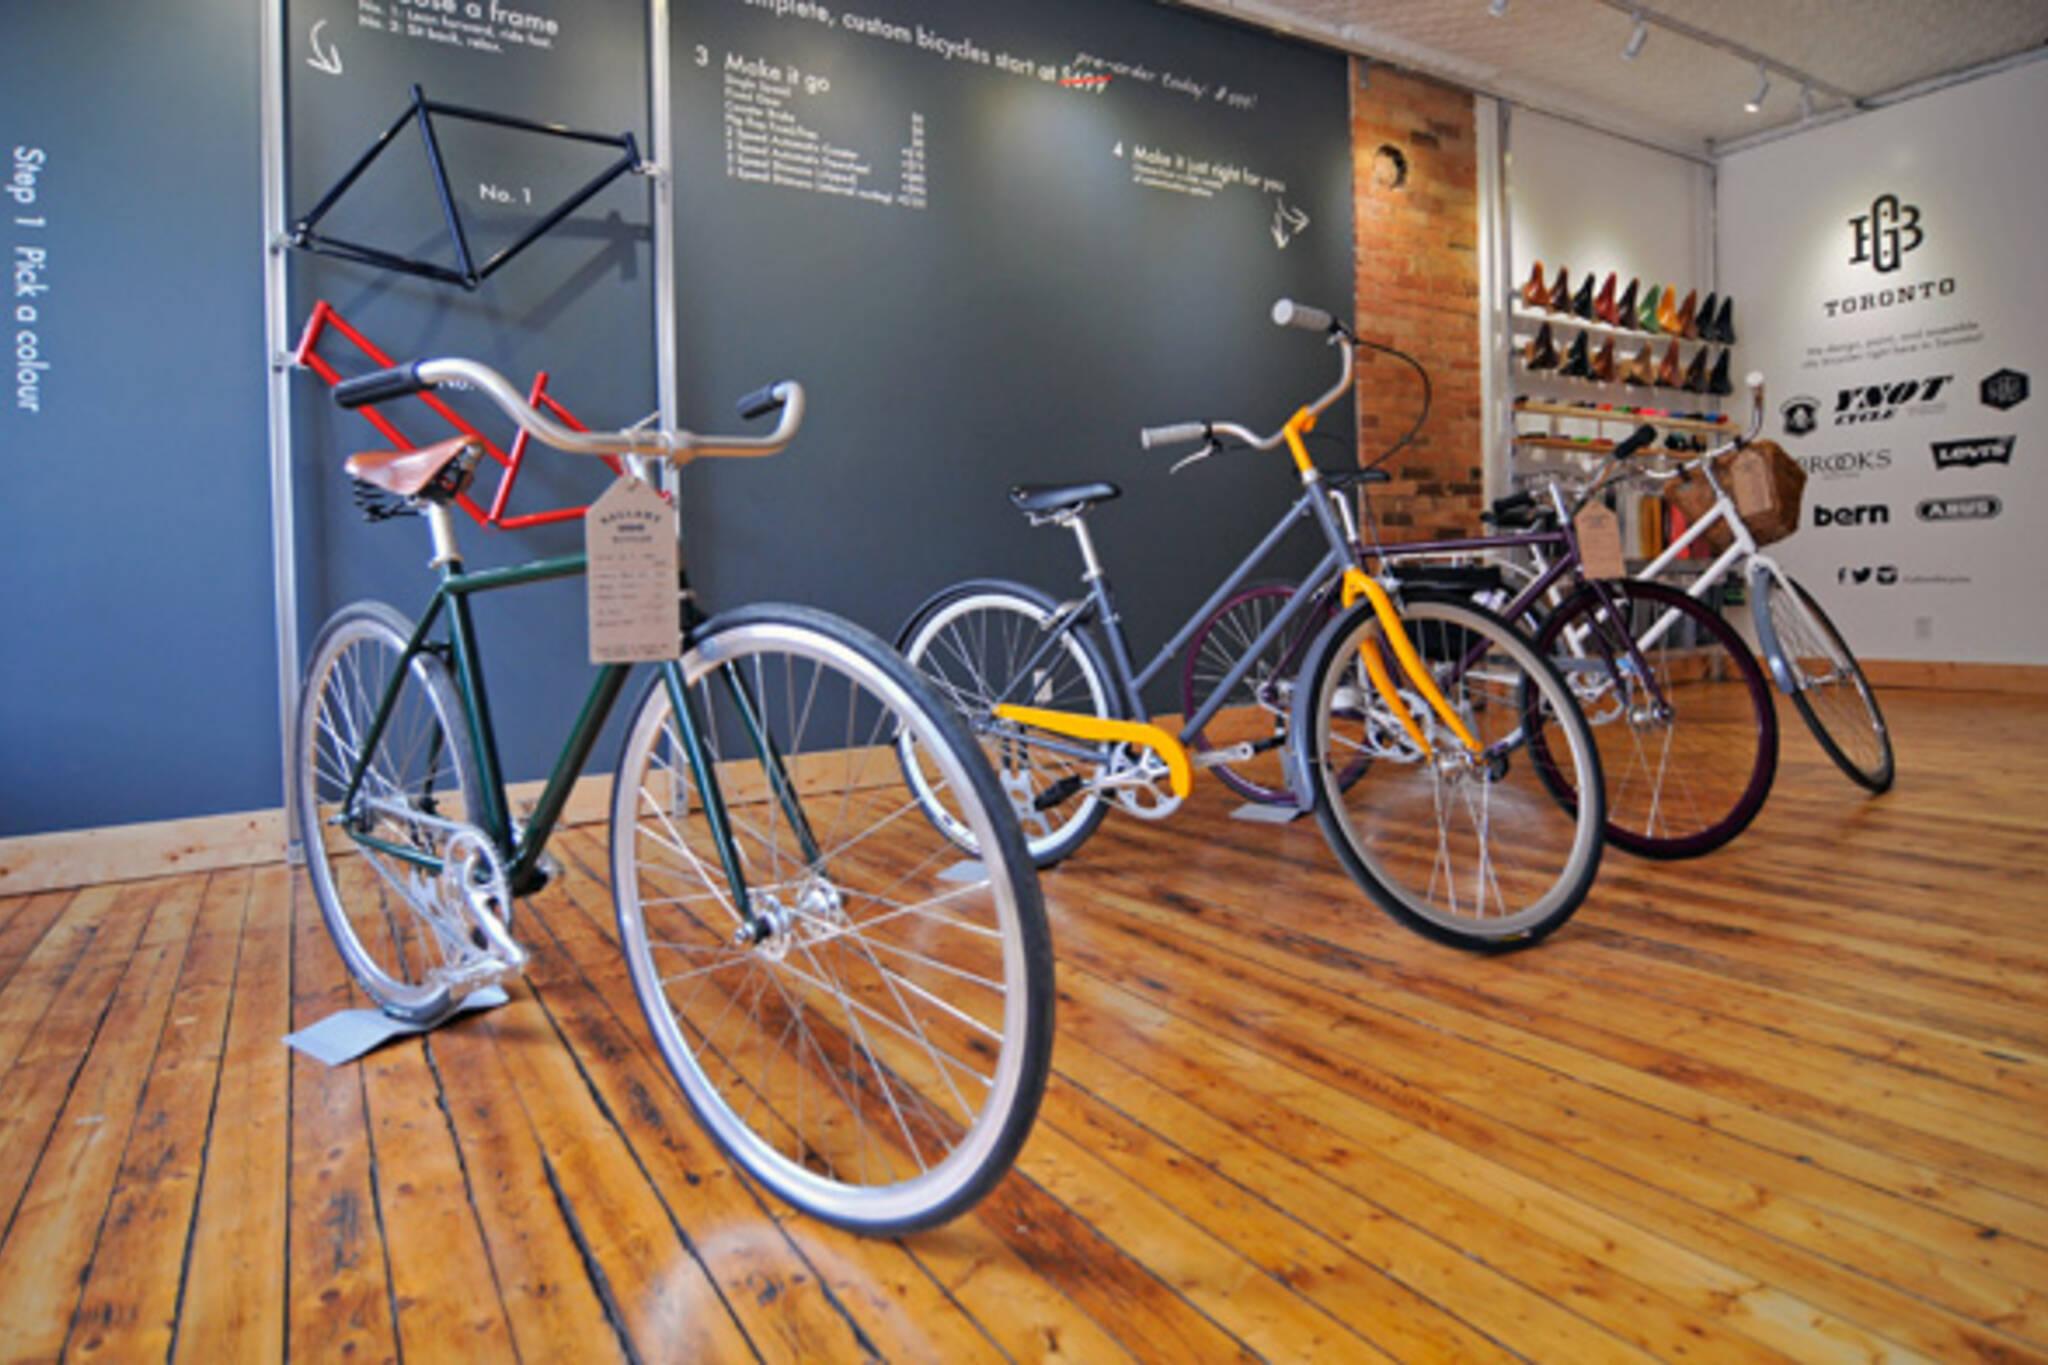 Toronto bicycle company